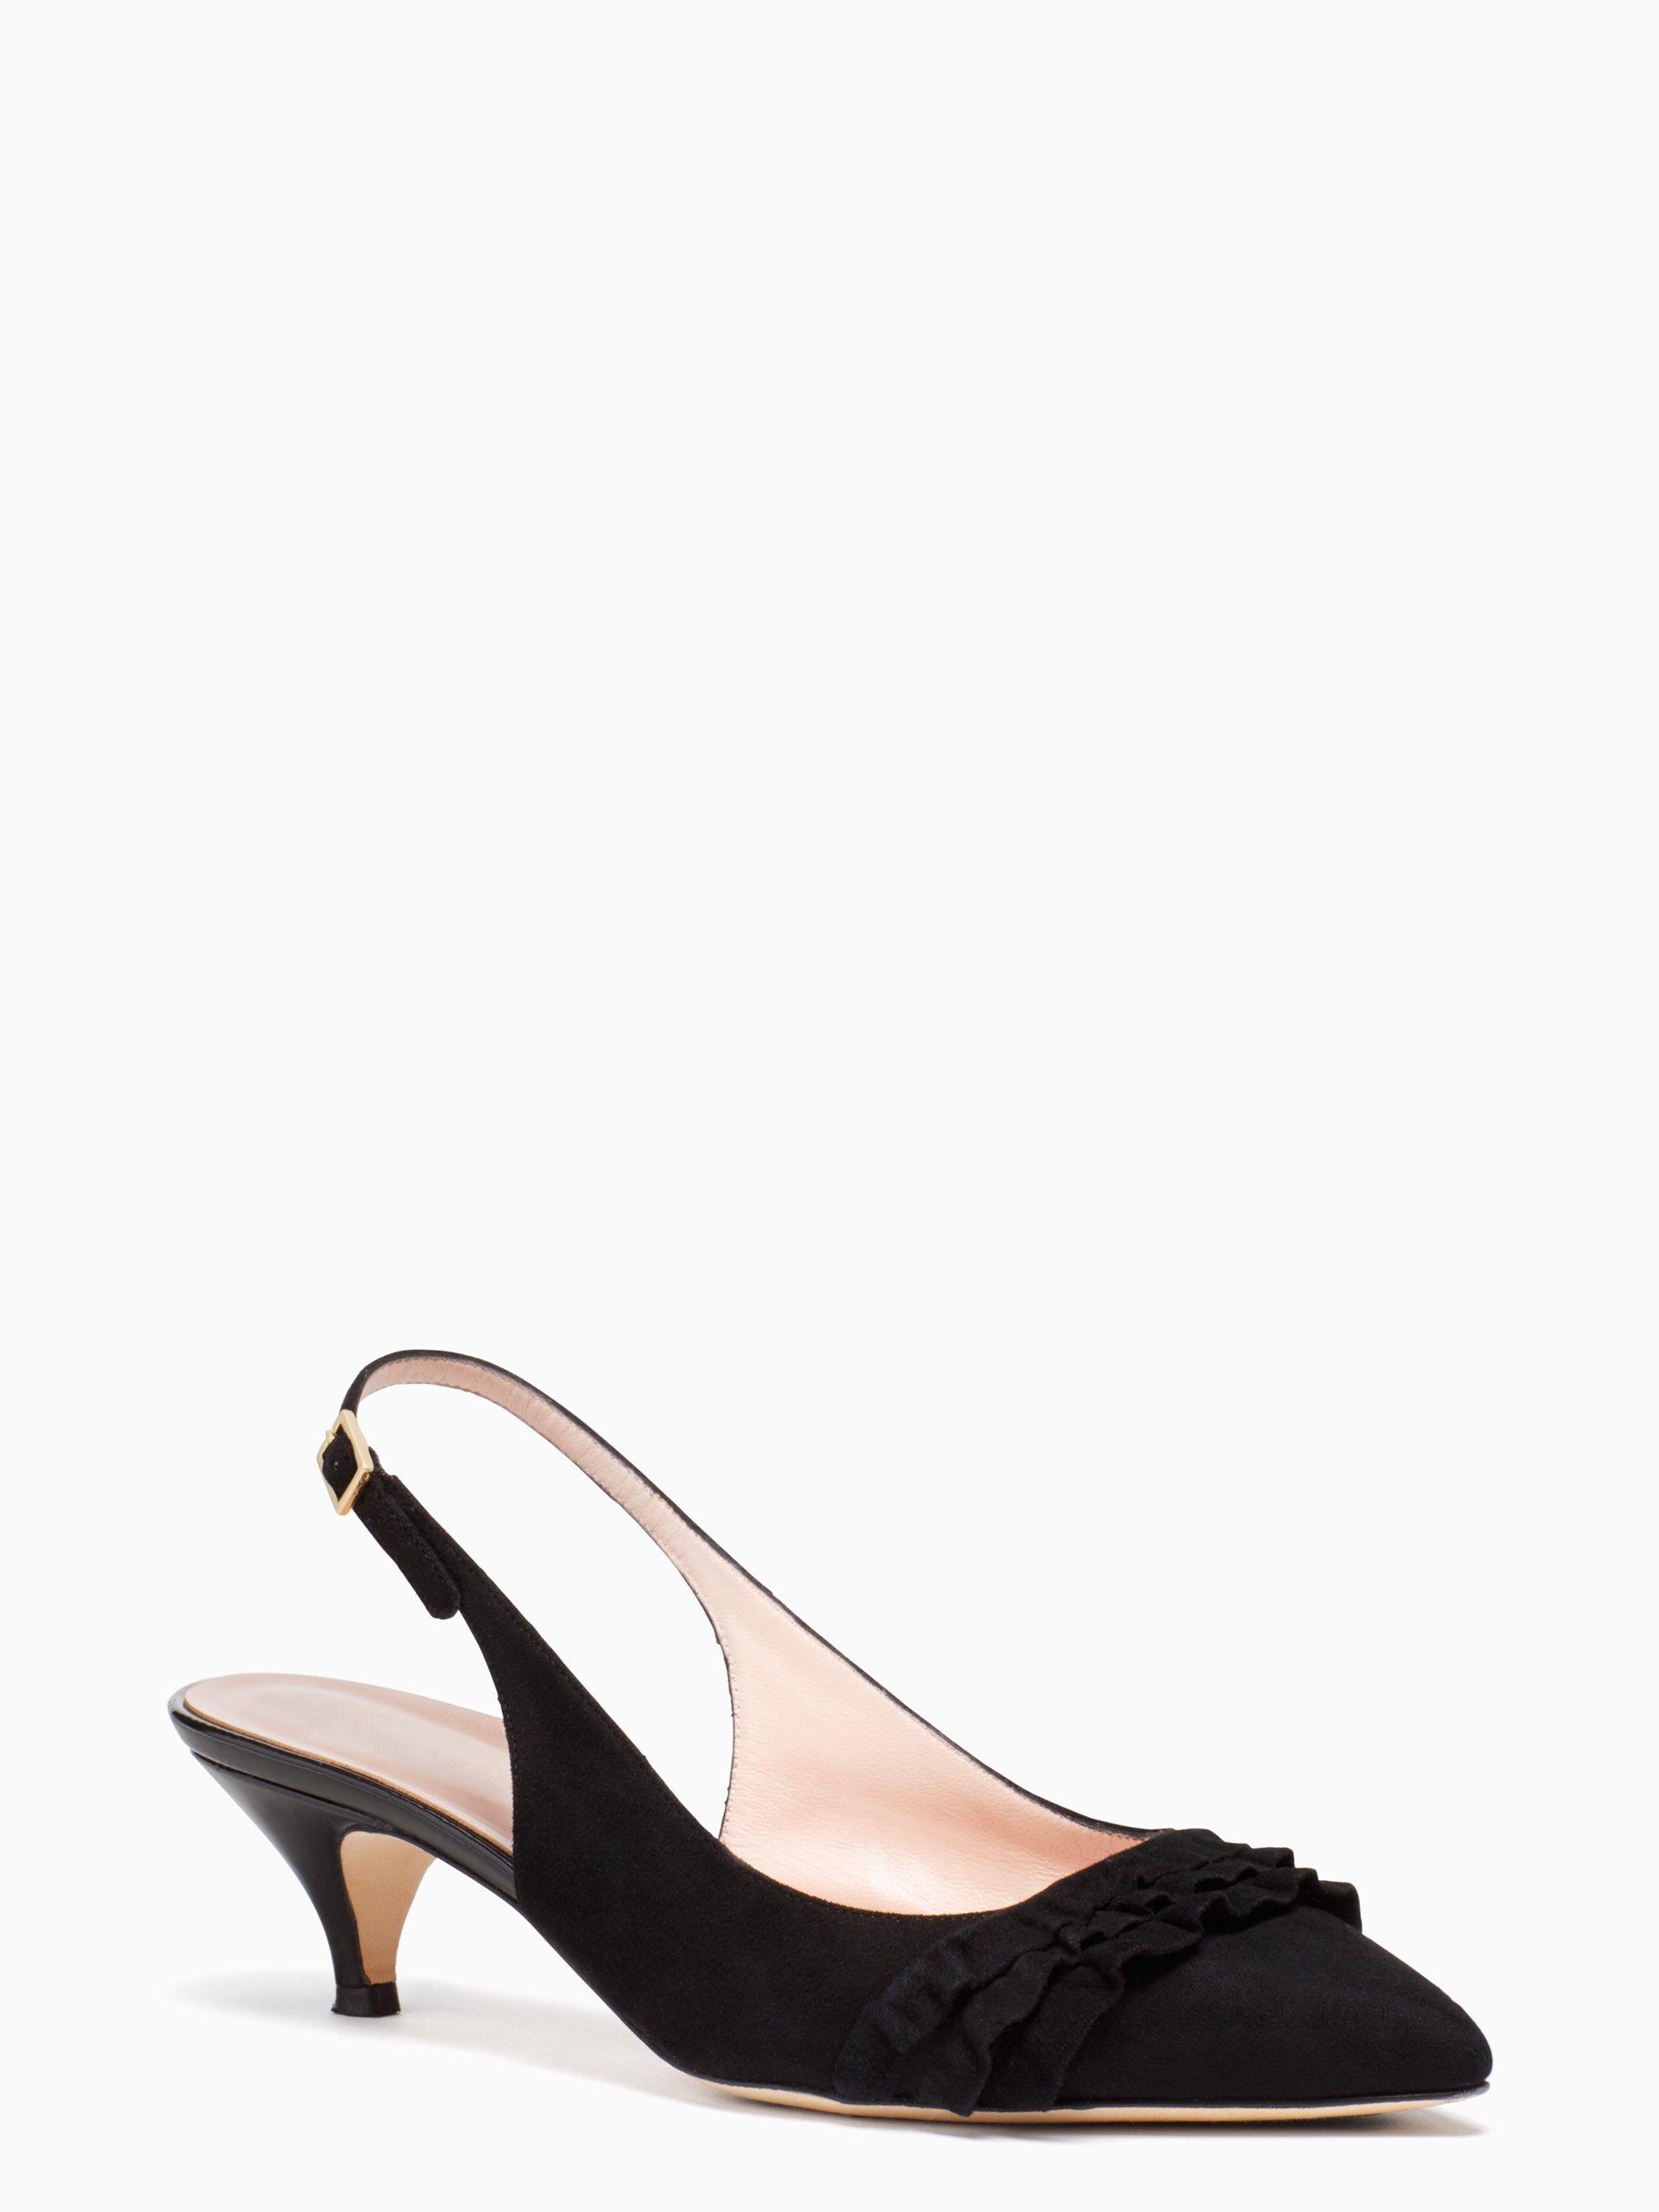 074fb6121dd1 KATE SPADE oliene heels.  katespade  shoes